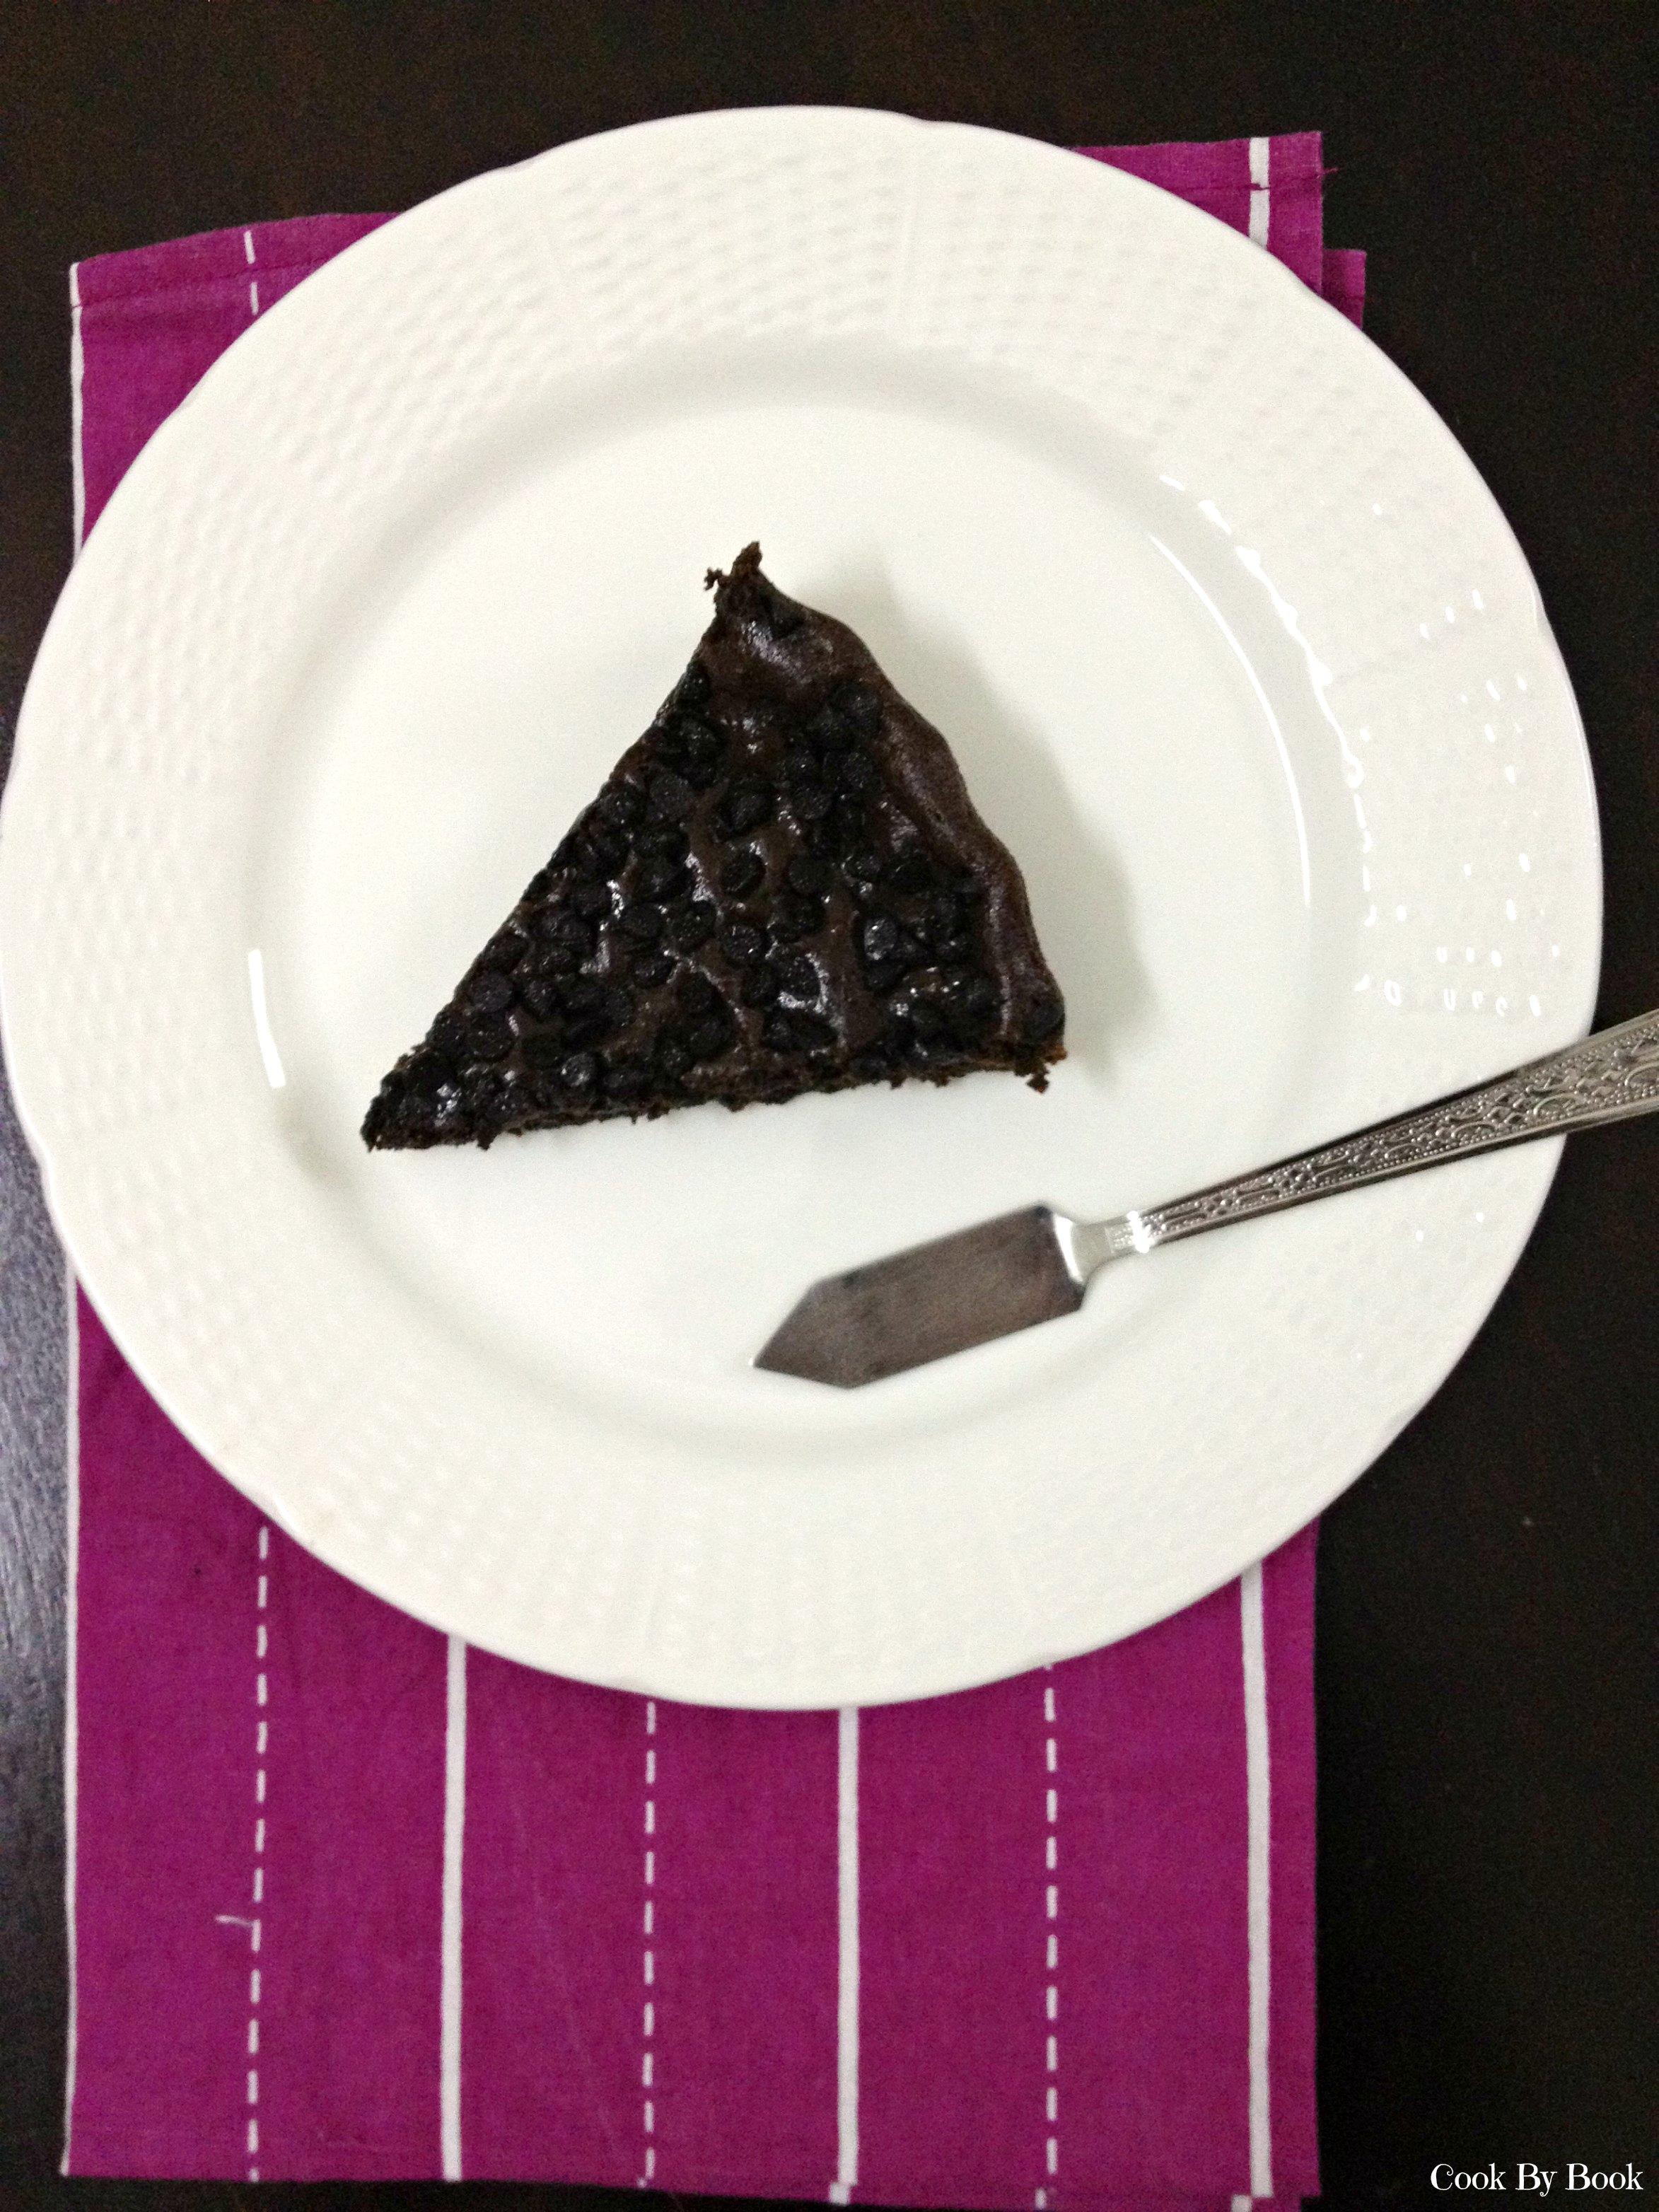 How To Cook Chocolate Cake